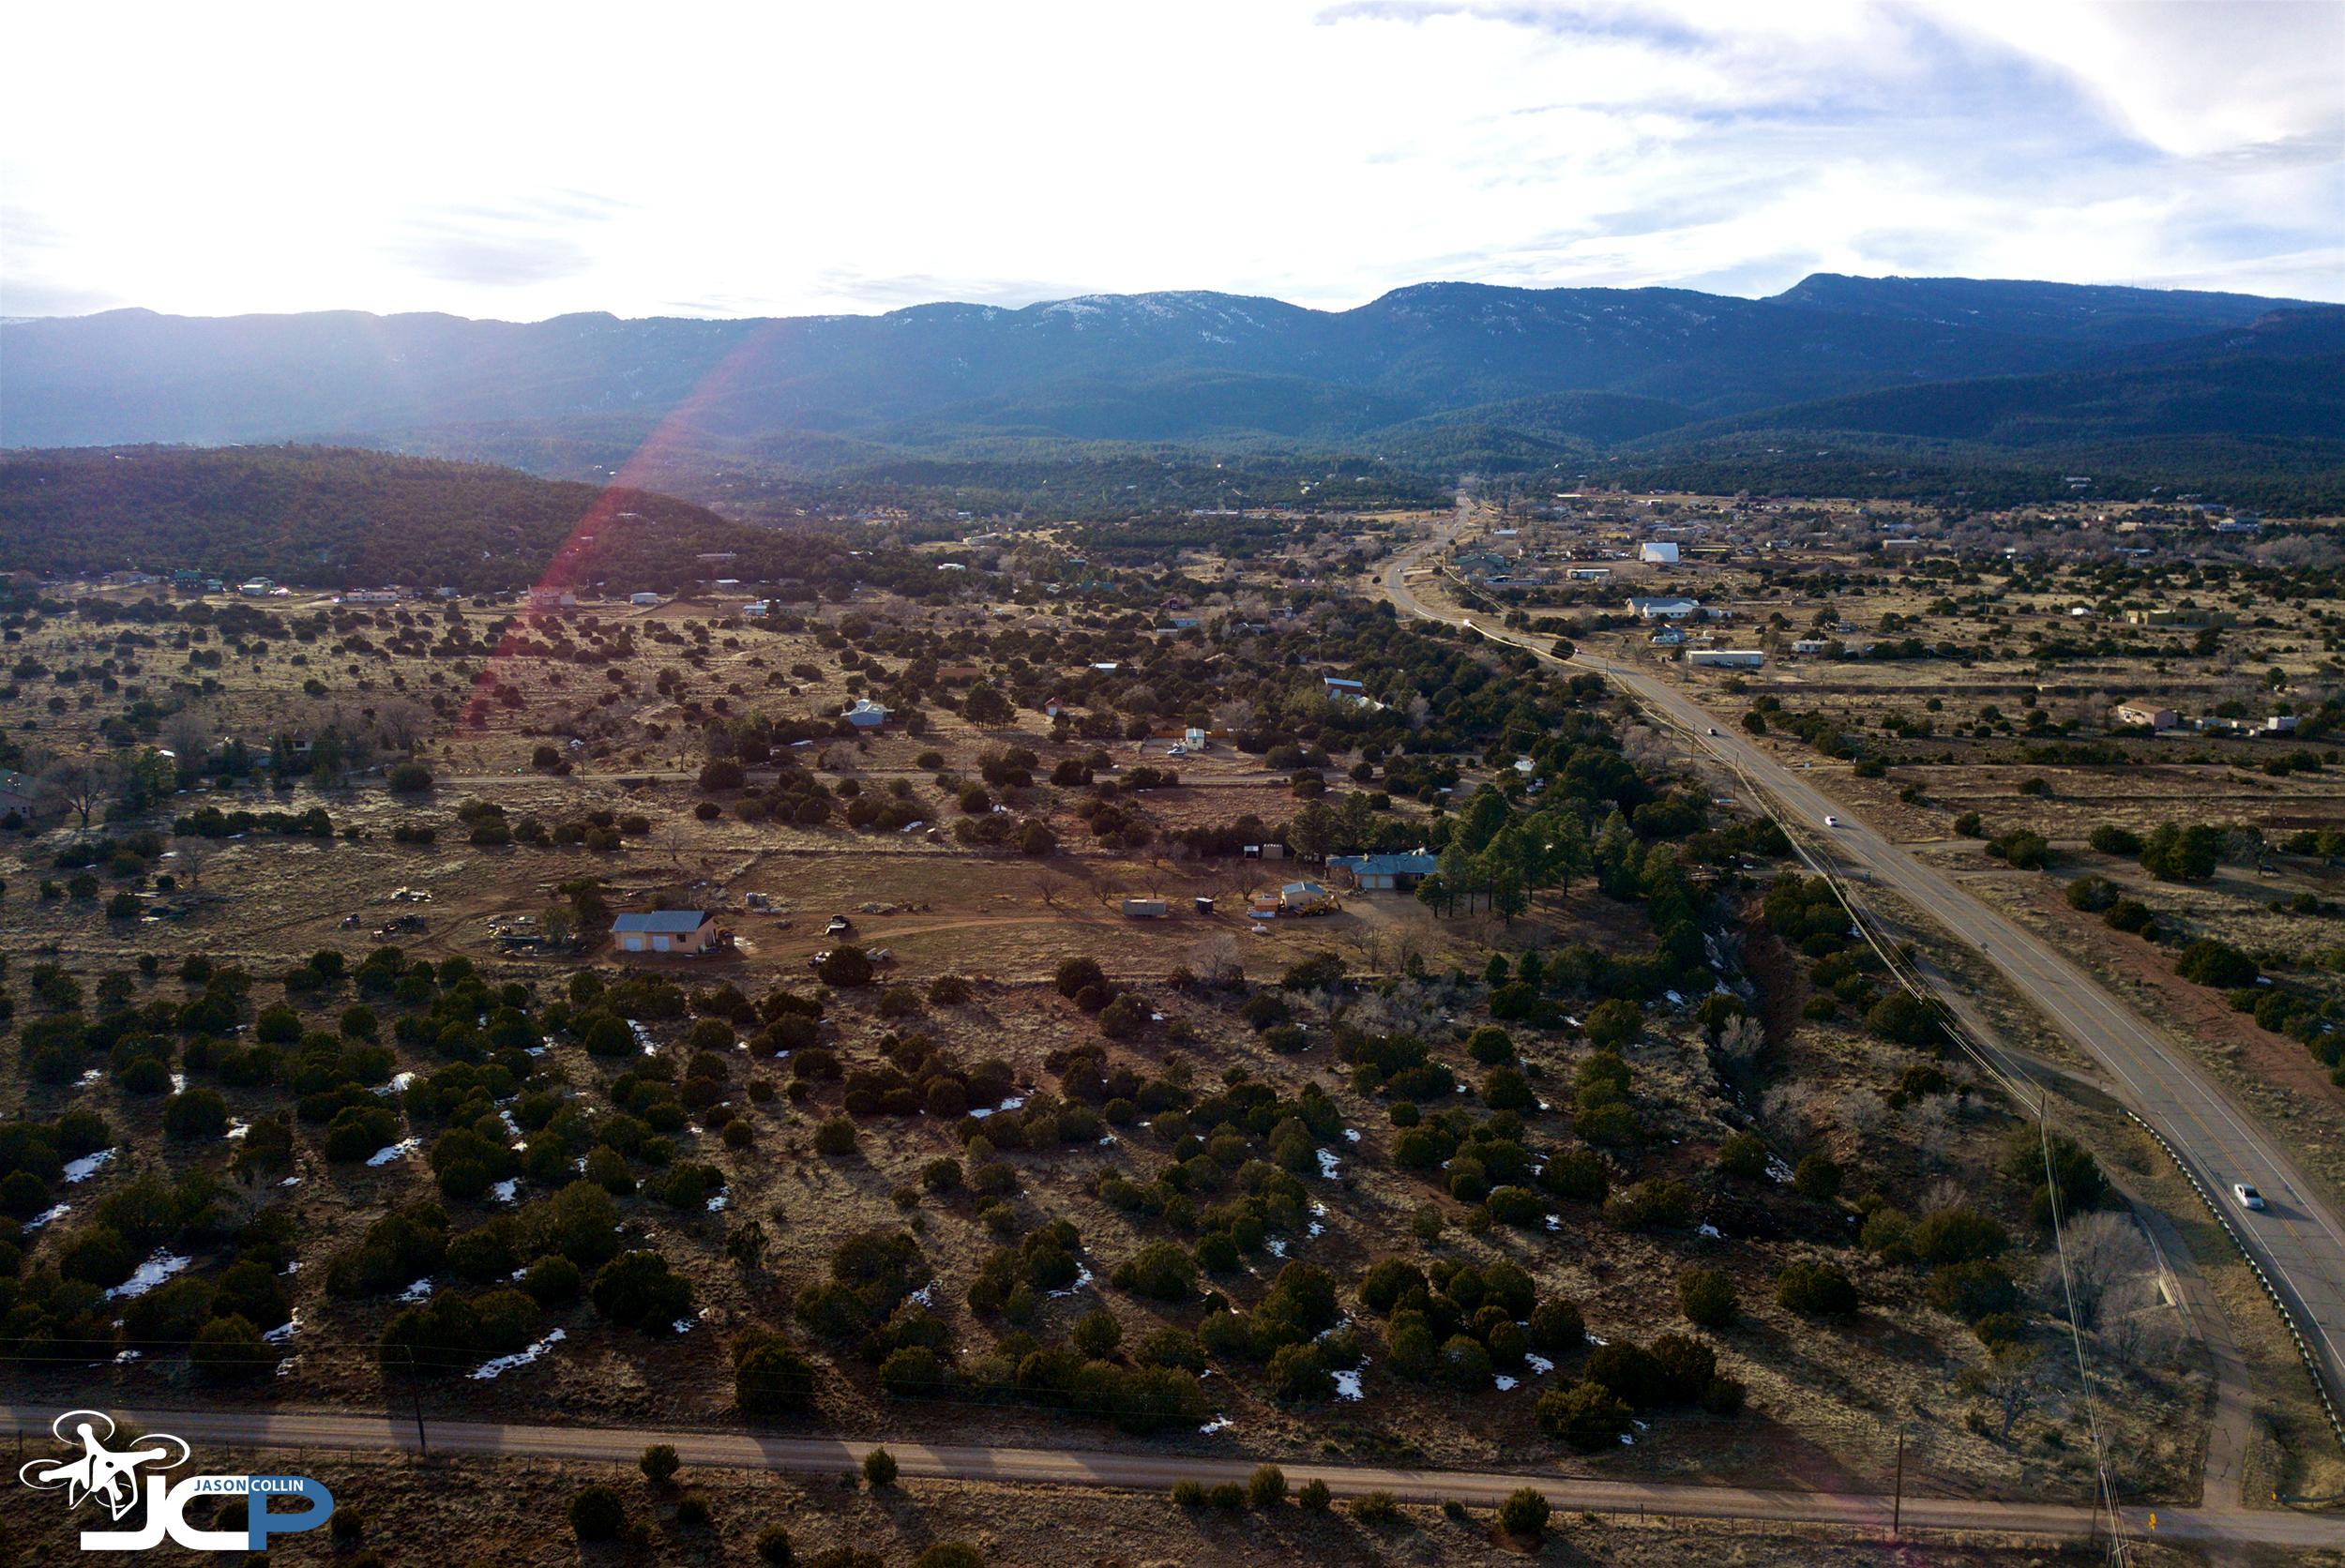 east-mountains-2-15-2019-david-120970.jpg